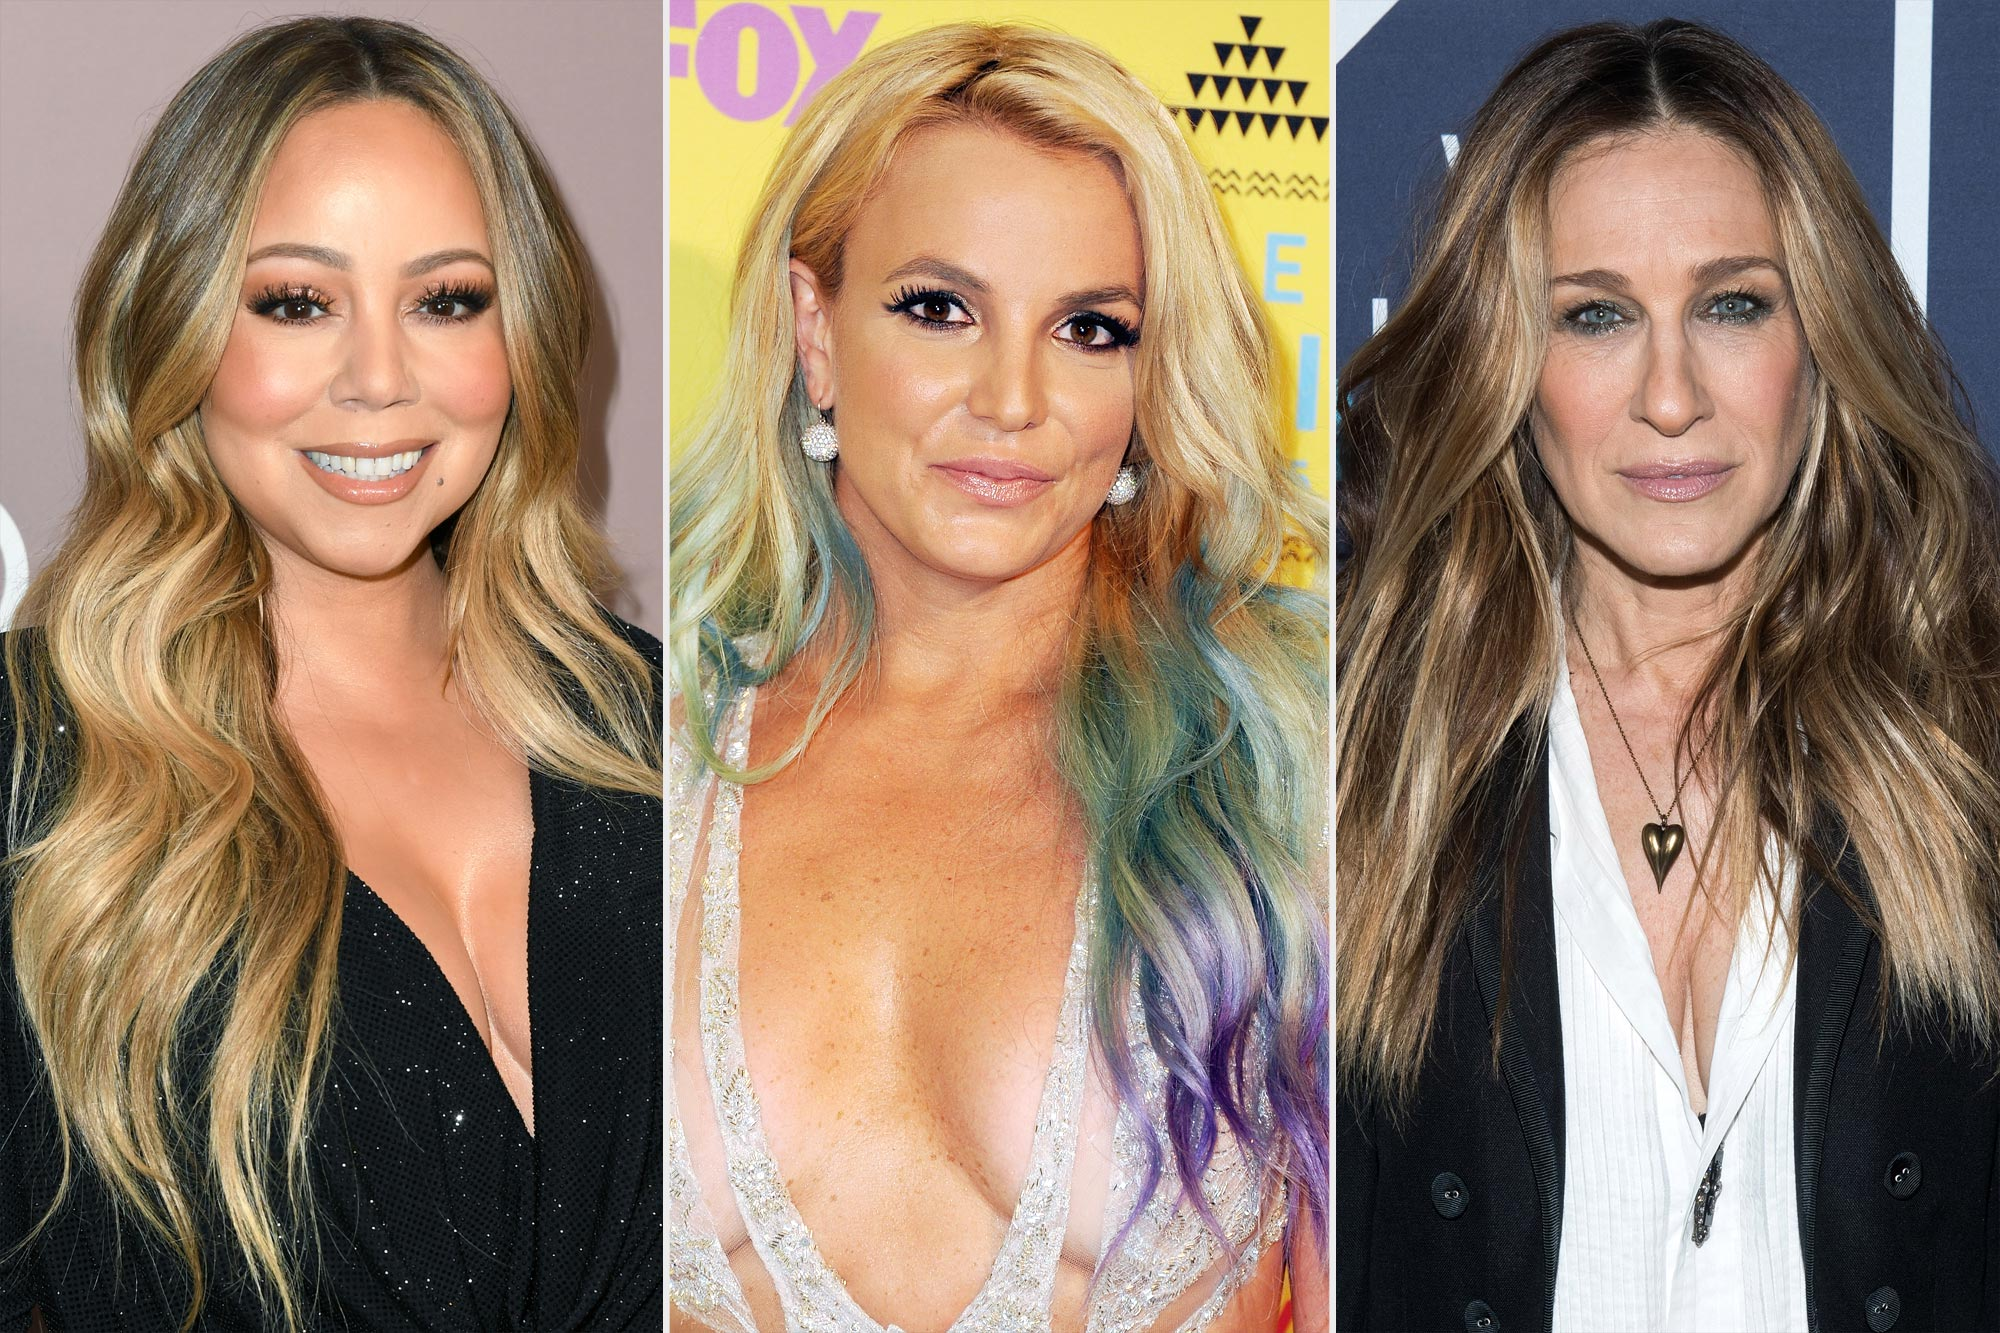 Mariah Carey; Britney Spears; Sarah Jessica Parker